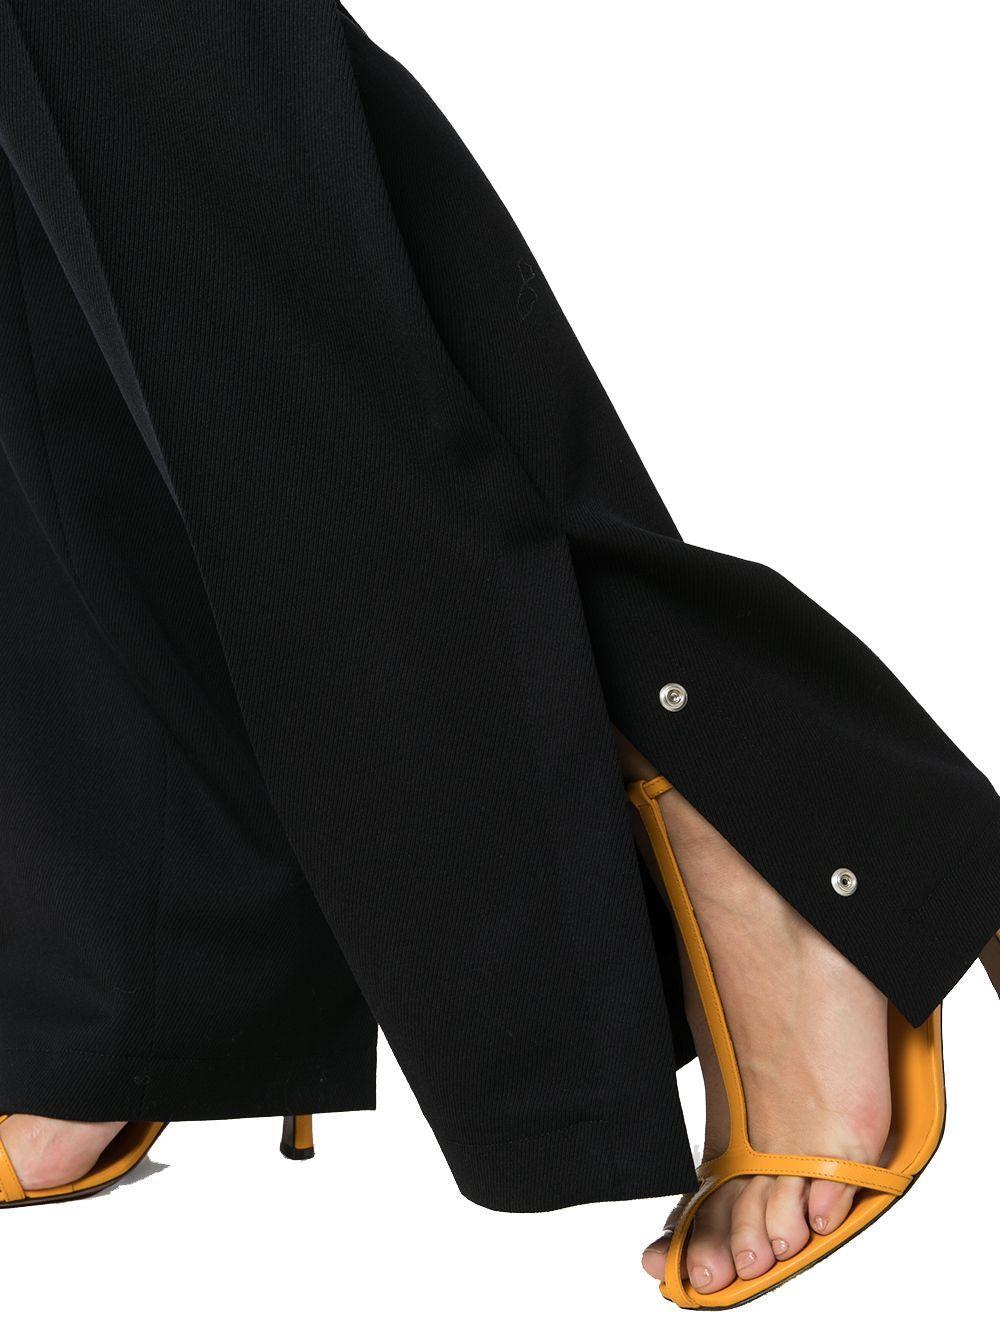 JIL SANDER WOMEN'S JSPP302104WP210600402 BLACK WOOL PANTS